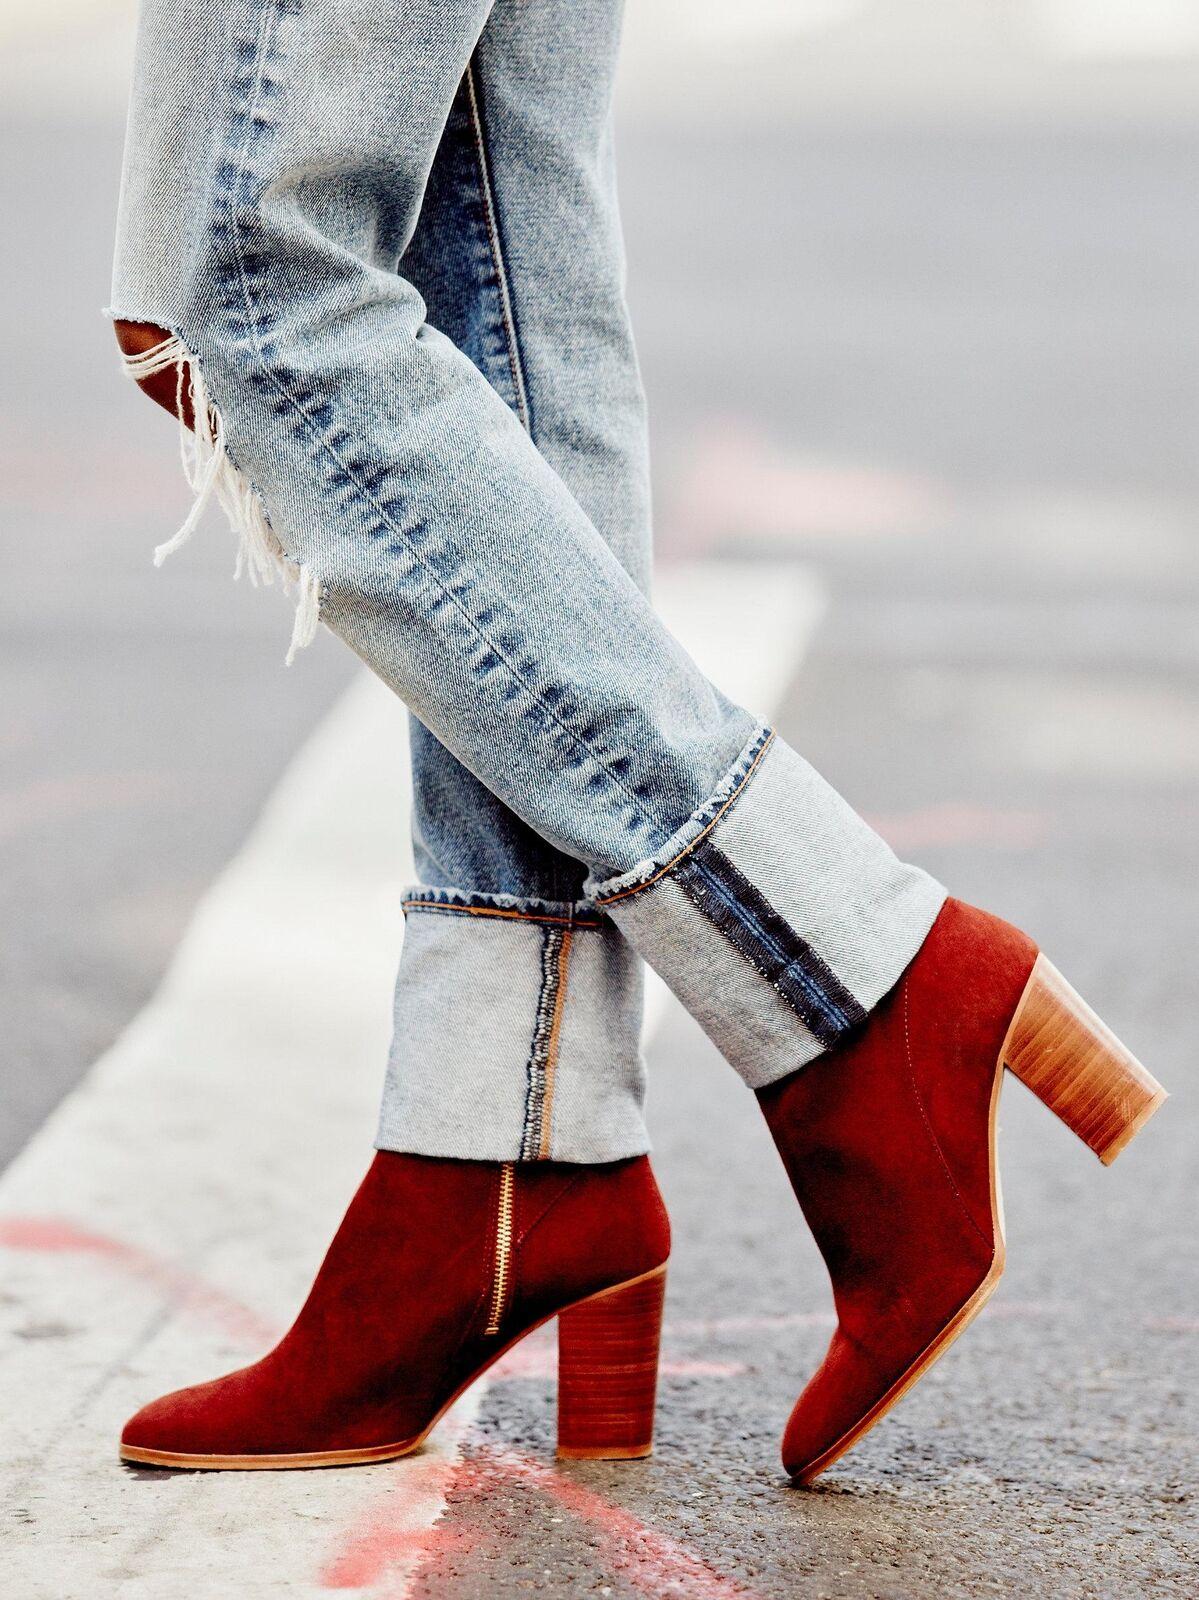 Free People Breakers Heel boot size 7 NEW suede MSRP   178